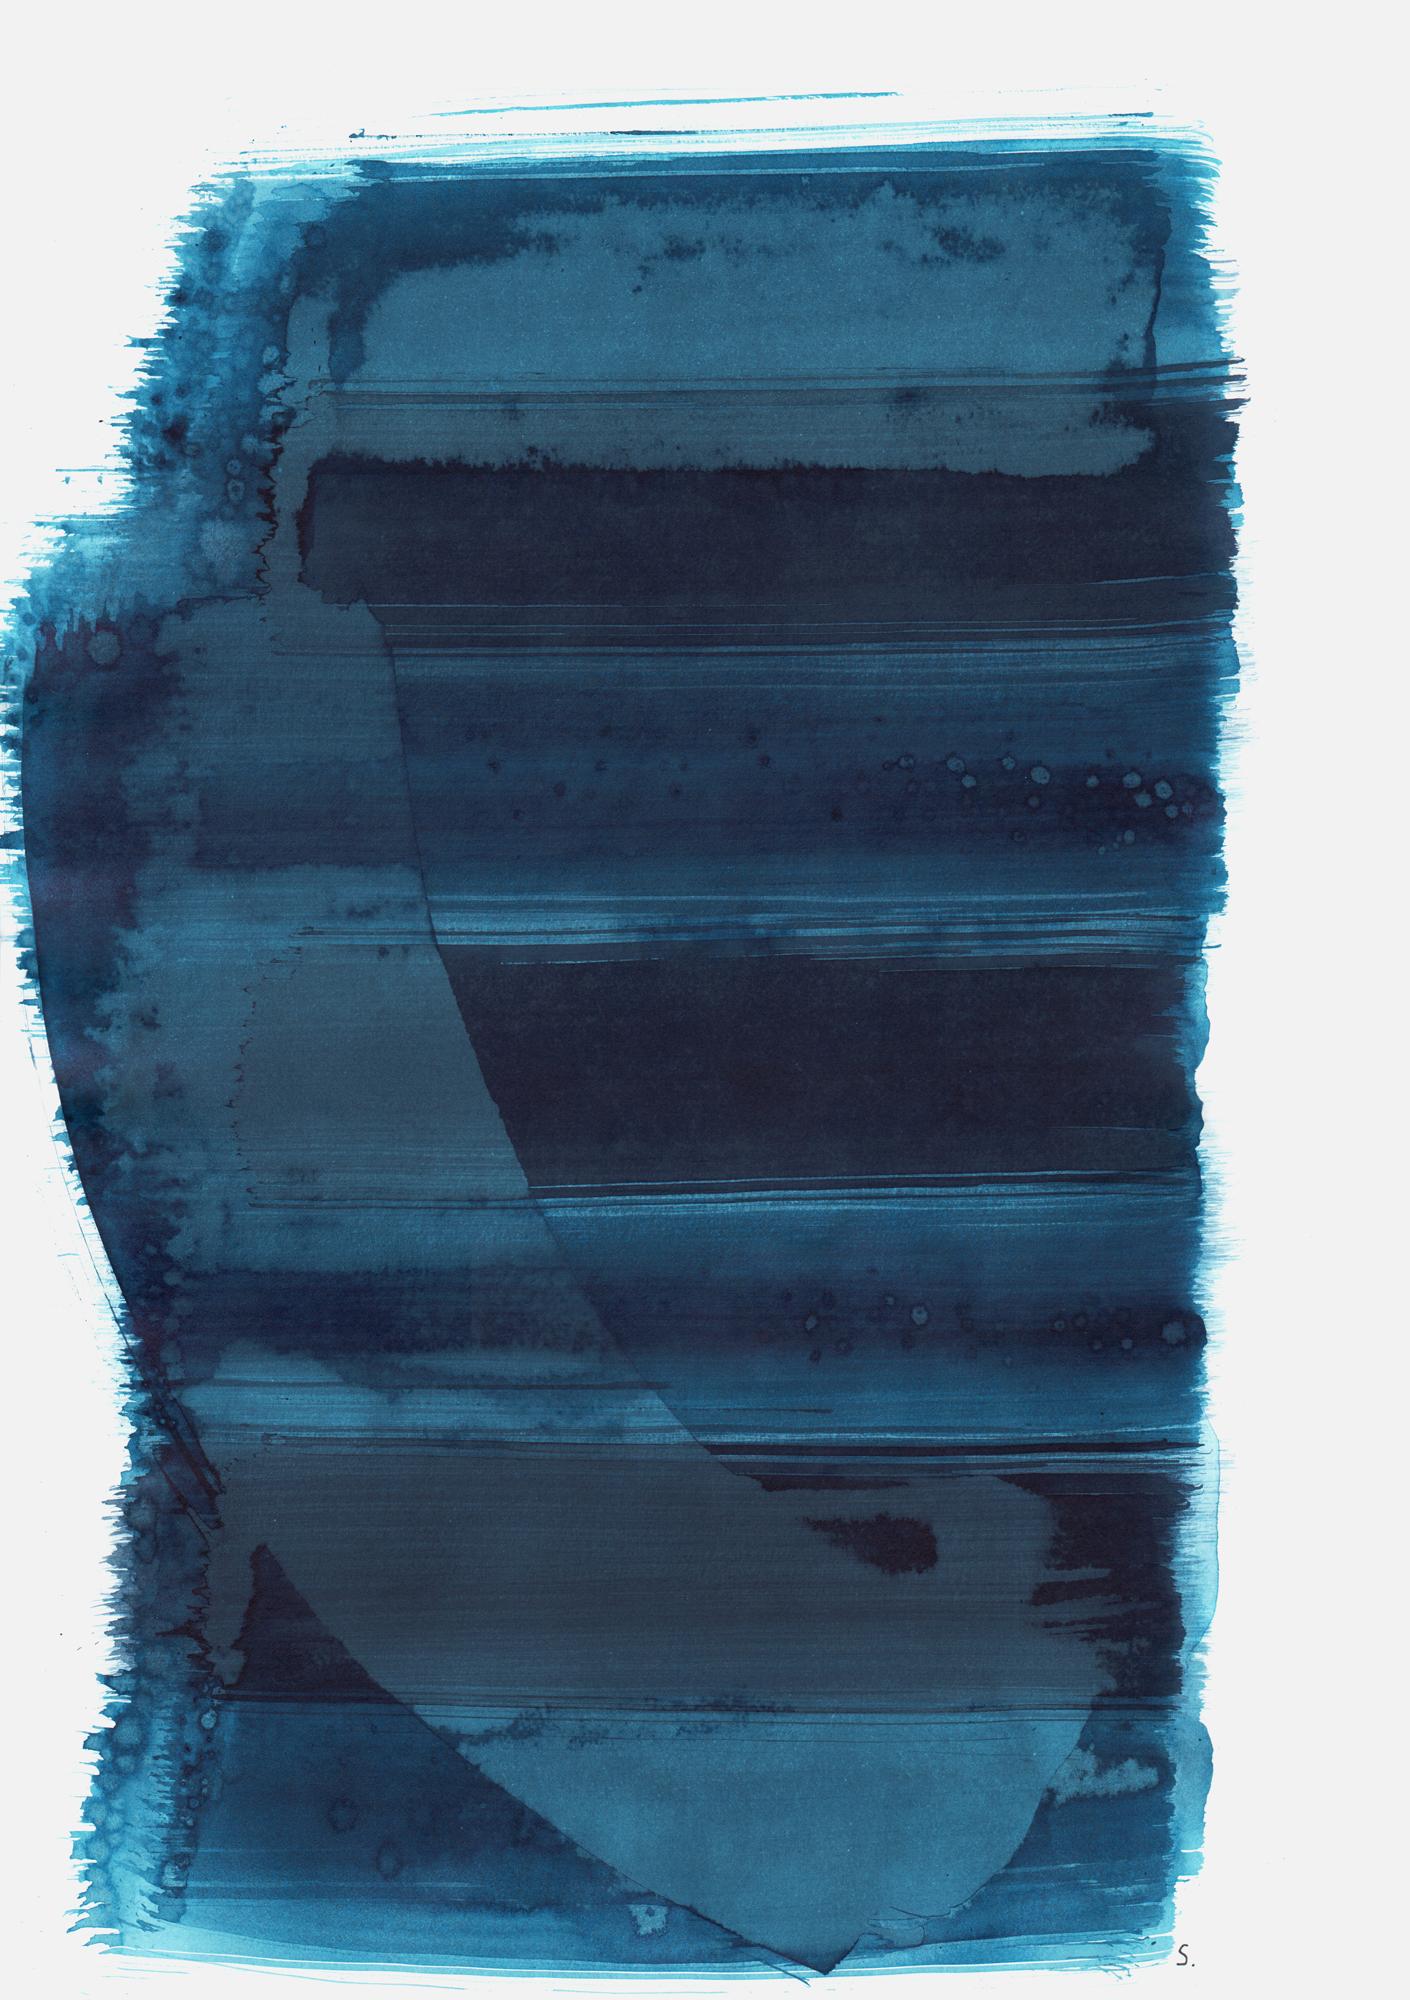 """An Isidor Frühling"", 2019, Tusche auf Papier, 48 x 36cm; ©: Konstanze Sailer [Frühling, Isidor; * 29.06.1931 in Berlin; deportiert aus Berlin; † nach dem 12.03.1943 in Auschwitz]"